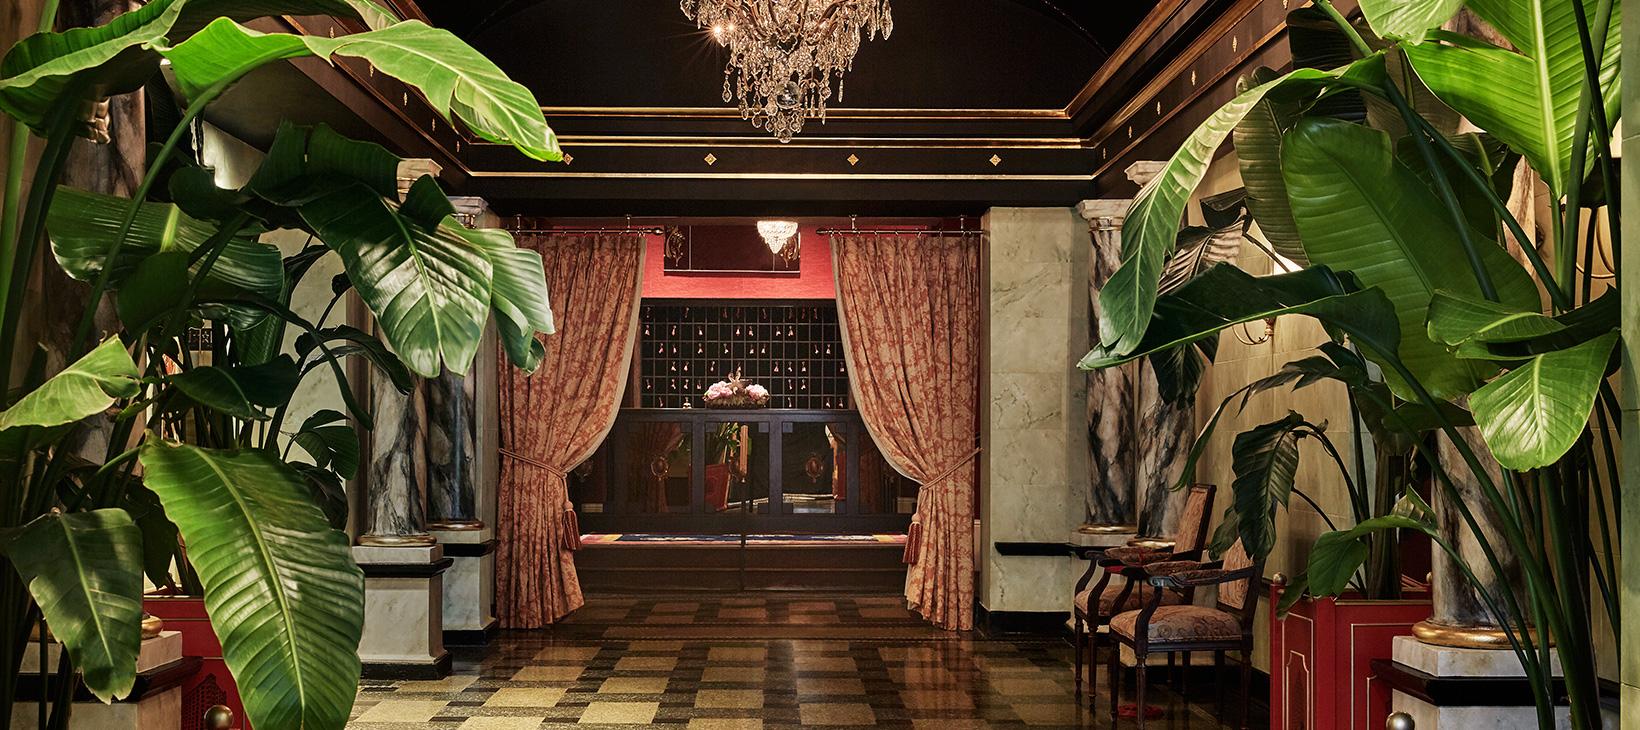 The Ponchatrain Hotel entrance and lobby